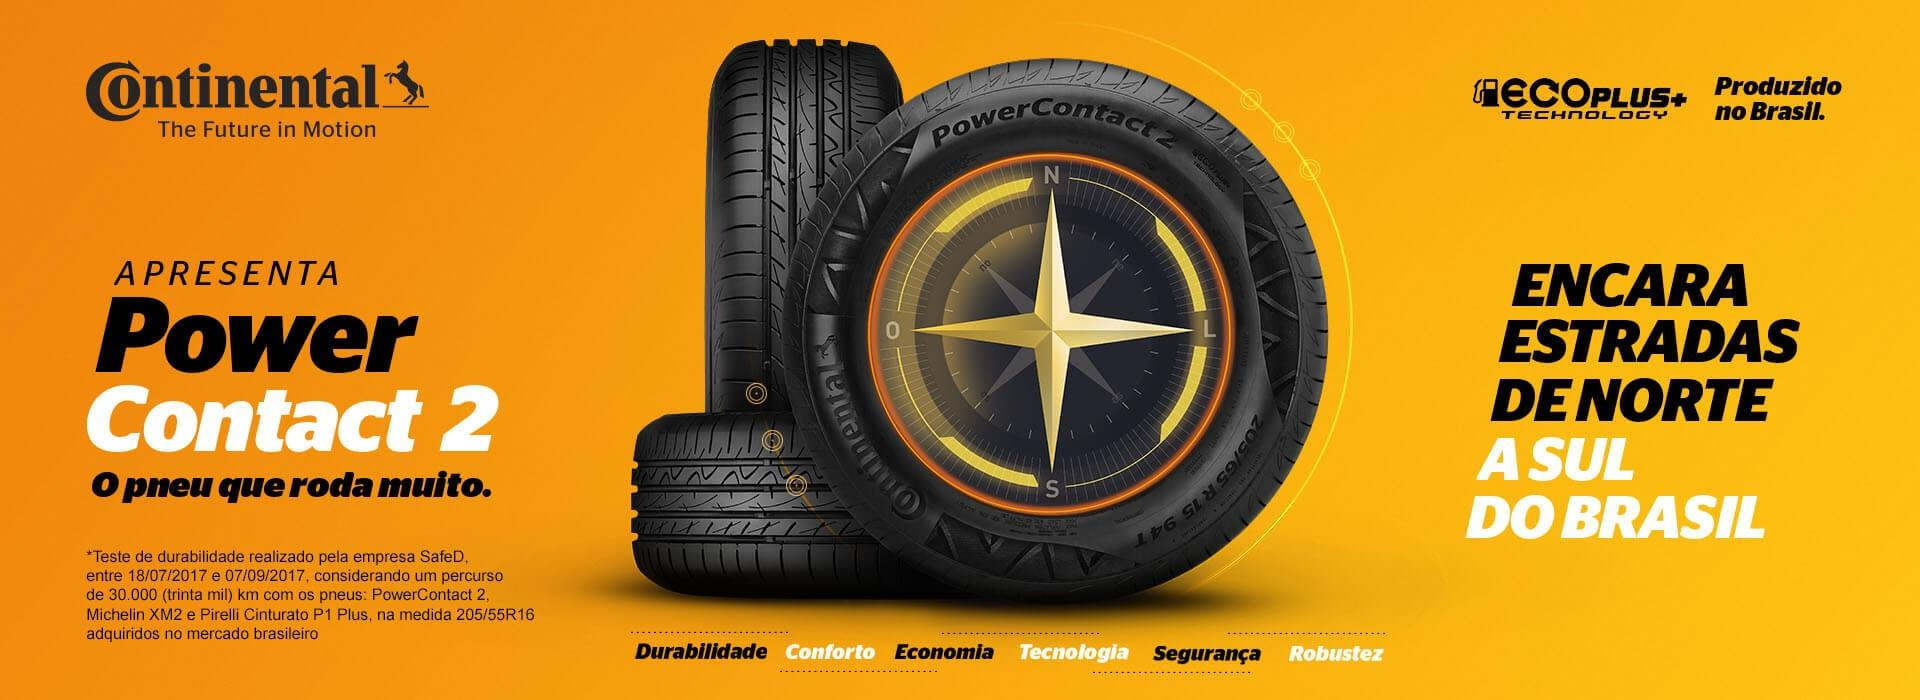 PowerContact2 - De Pneus Continental